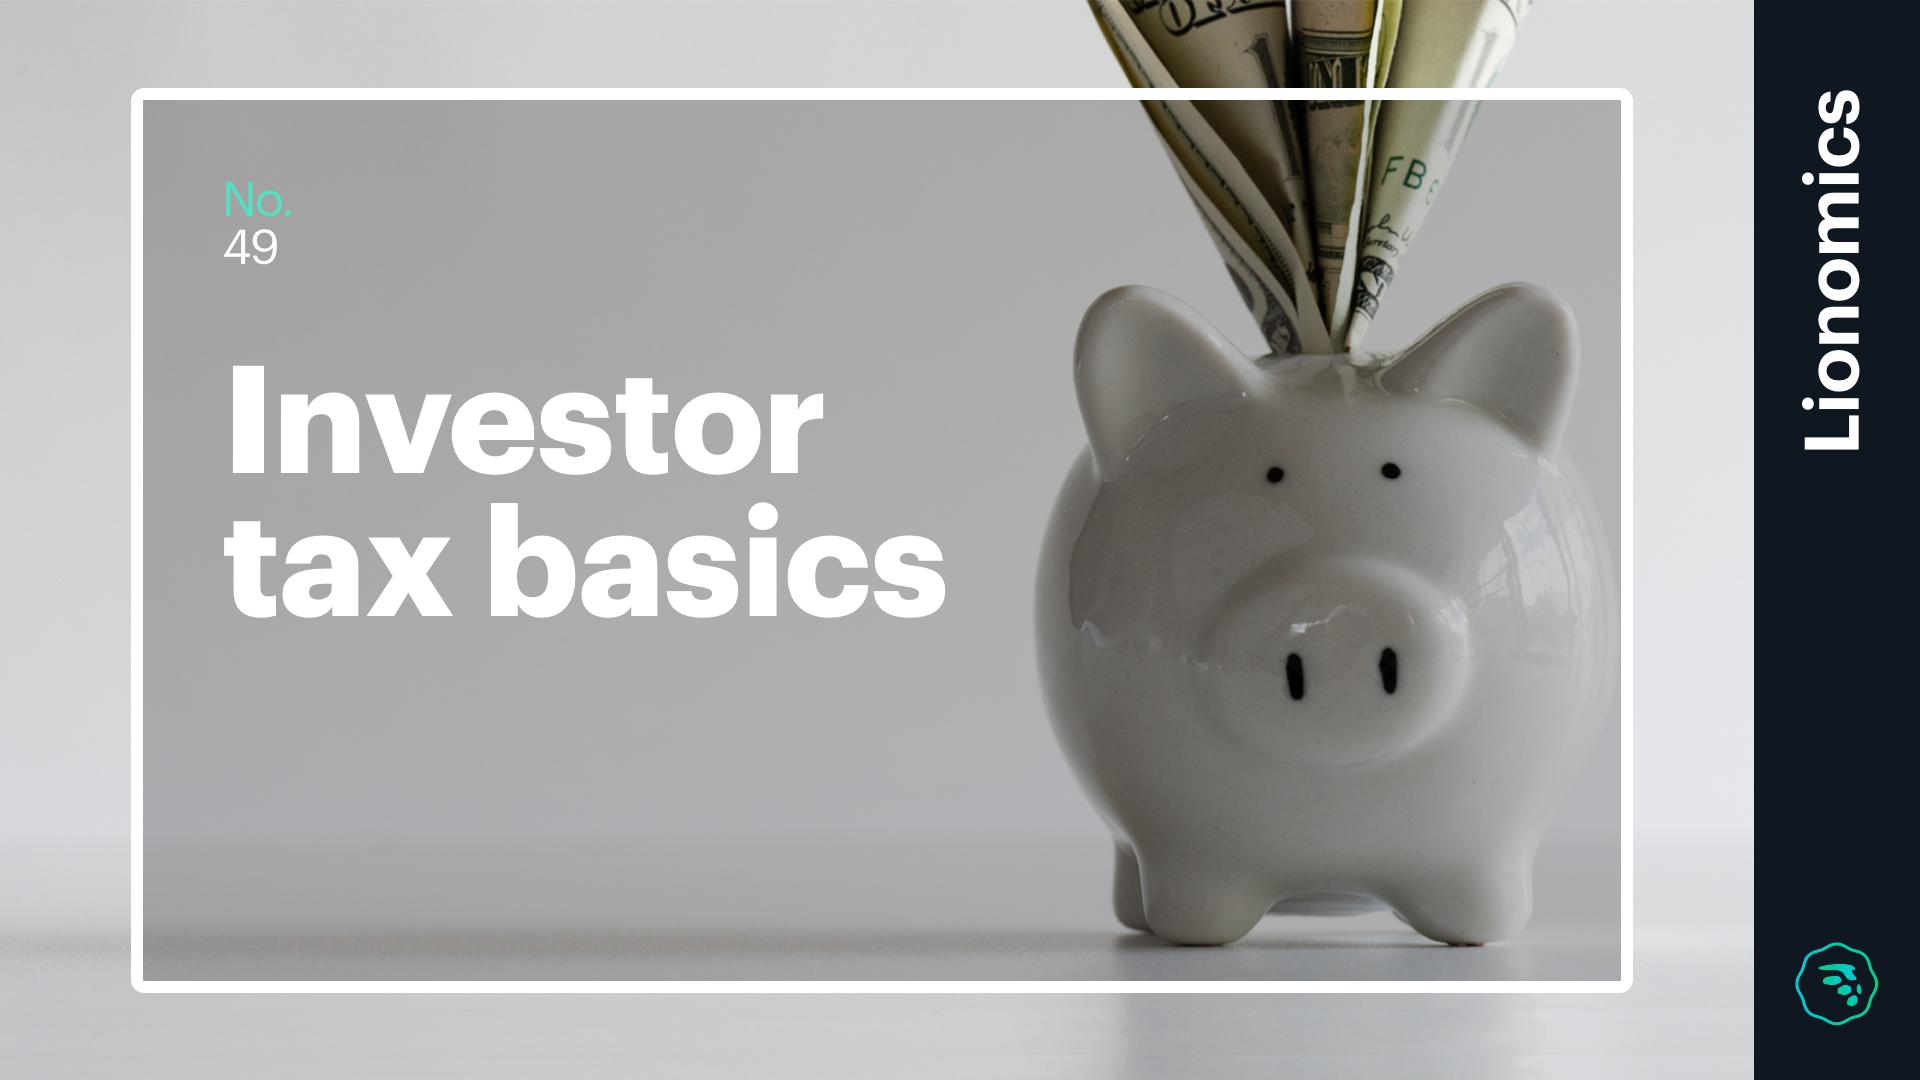 Lionomics 49 Blog Investor tax basics 01022019 1